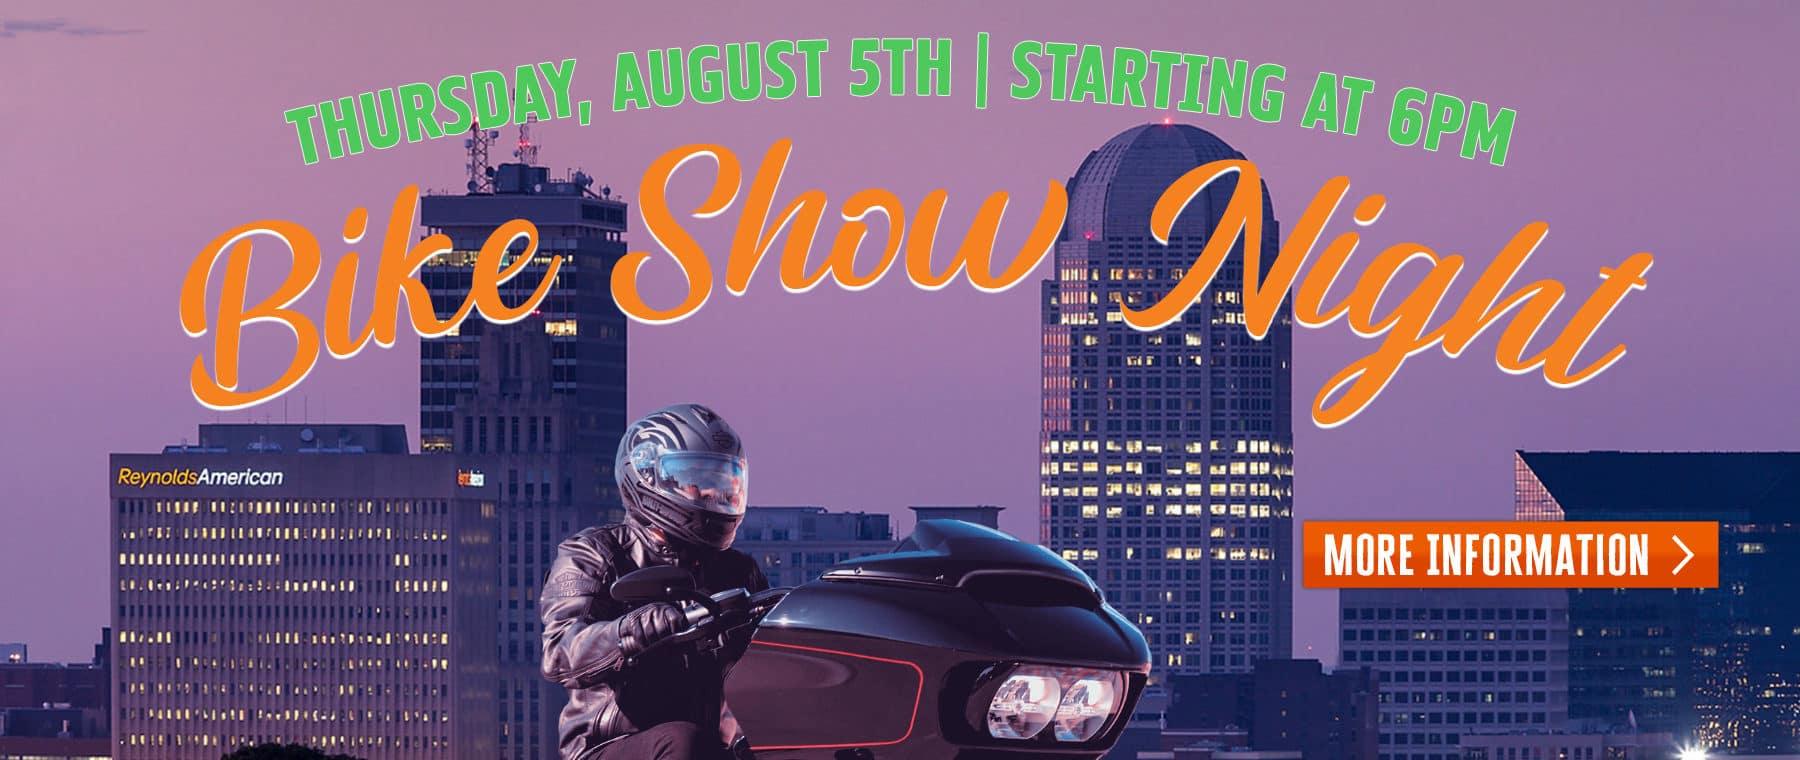 Bike Show Night – Web Banner 5